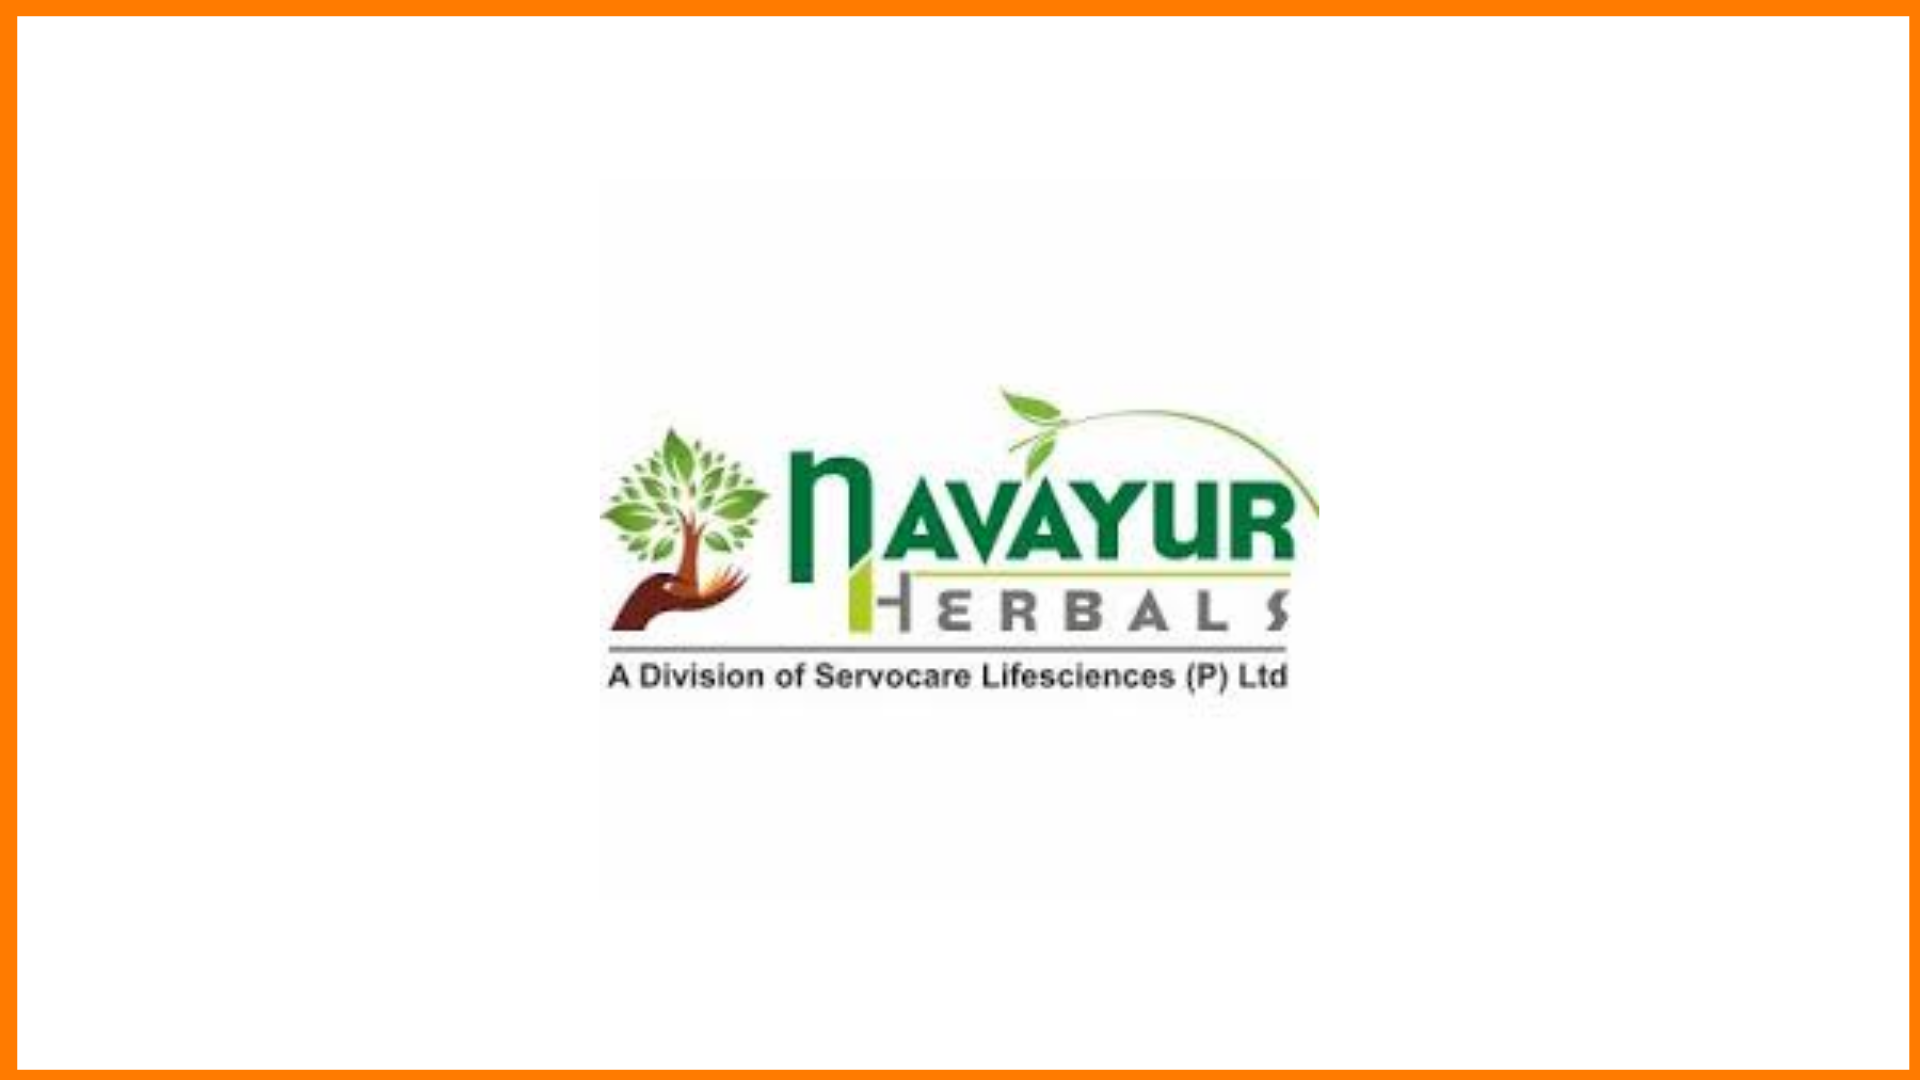 nAVAYUR Herbals Logo